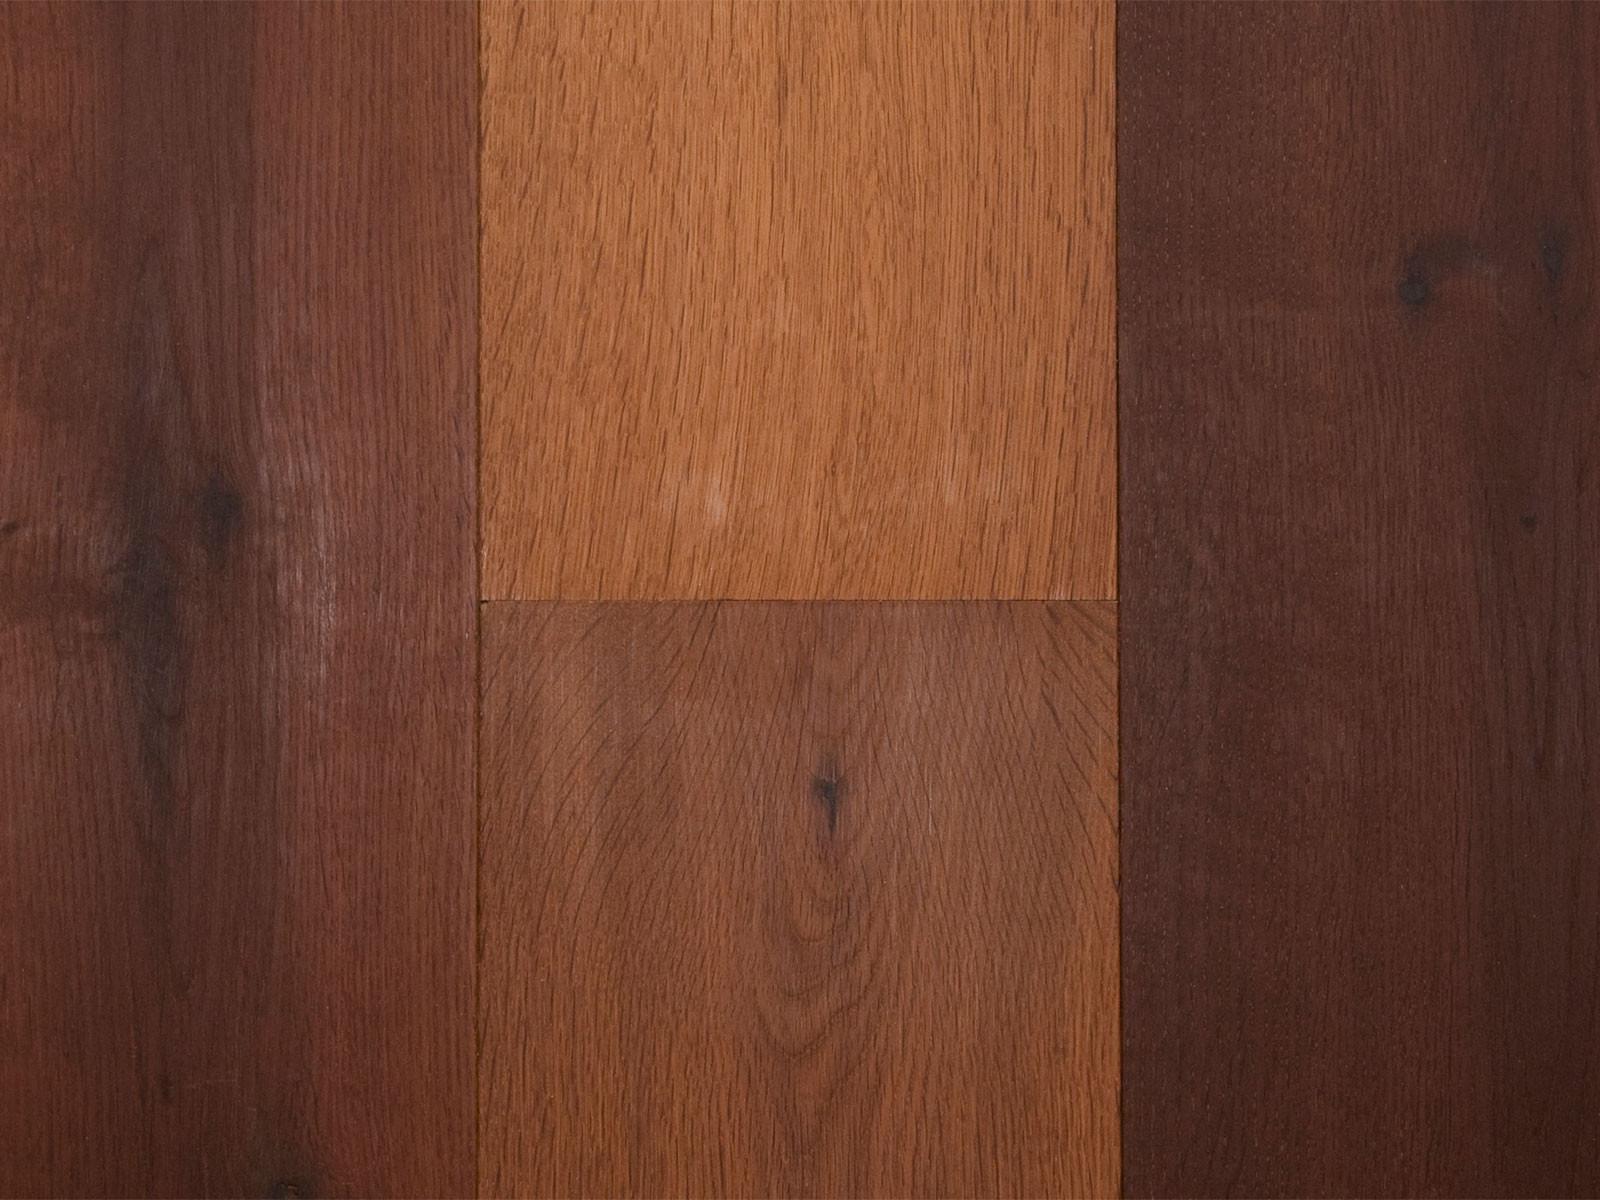 cheap hardwood flooring uk of duchateau hardwood flooring houston tx discount engineered wood with regard to savoy european oak